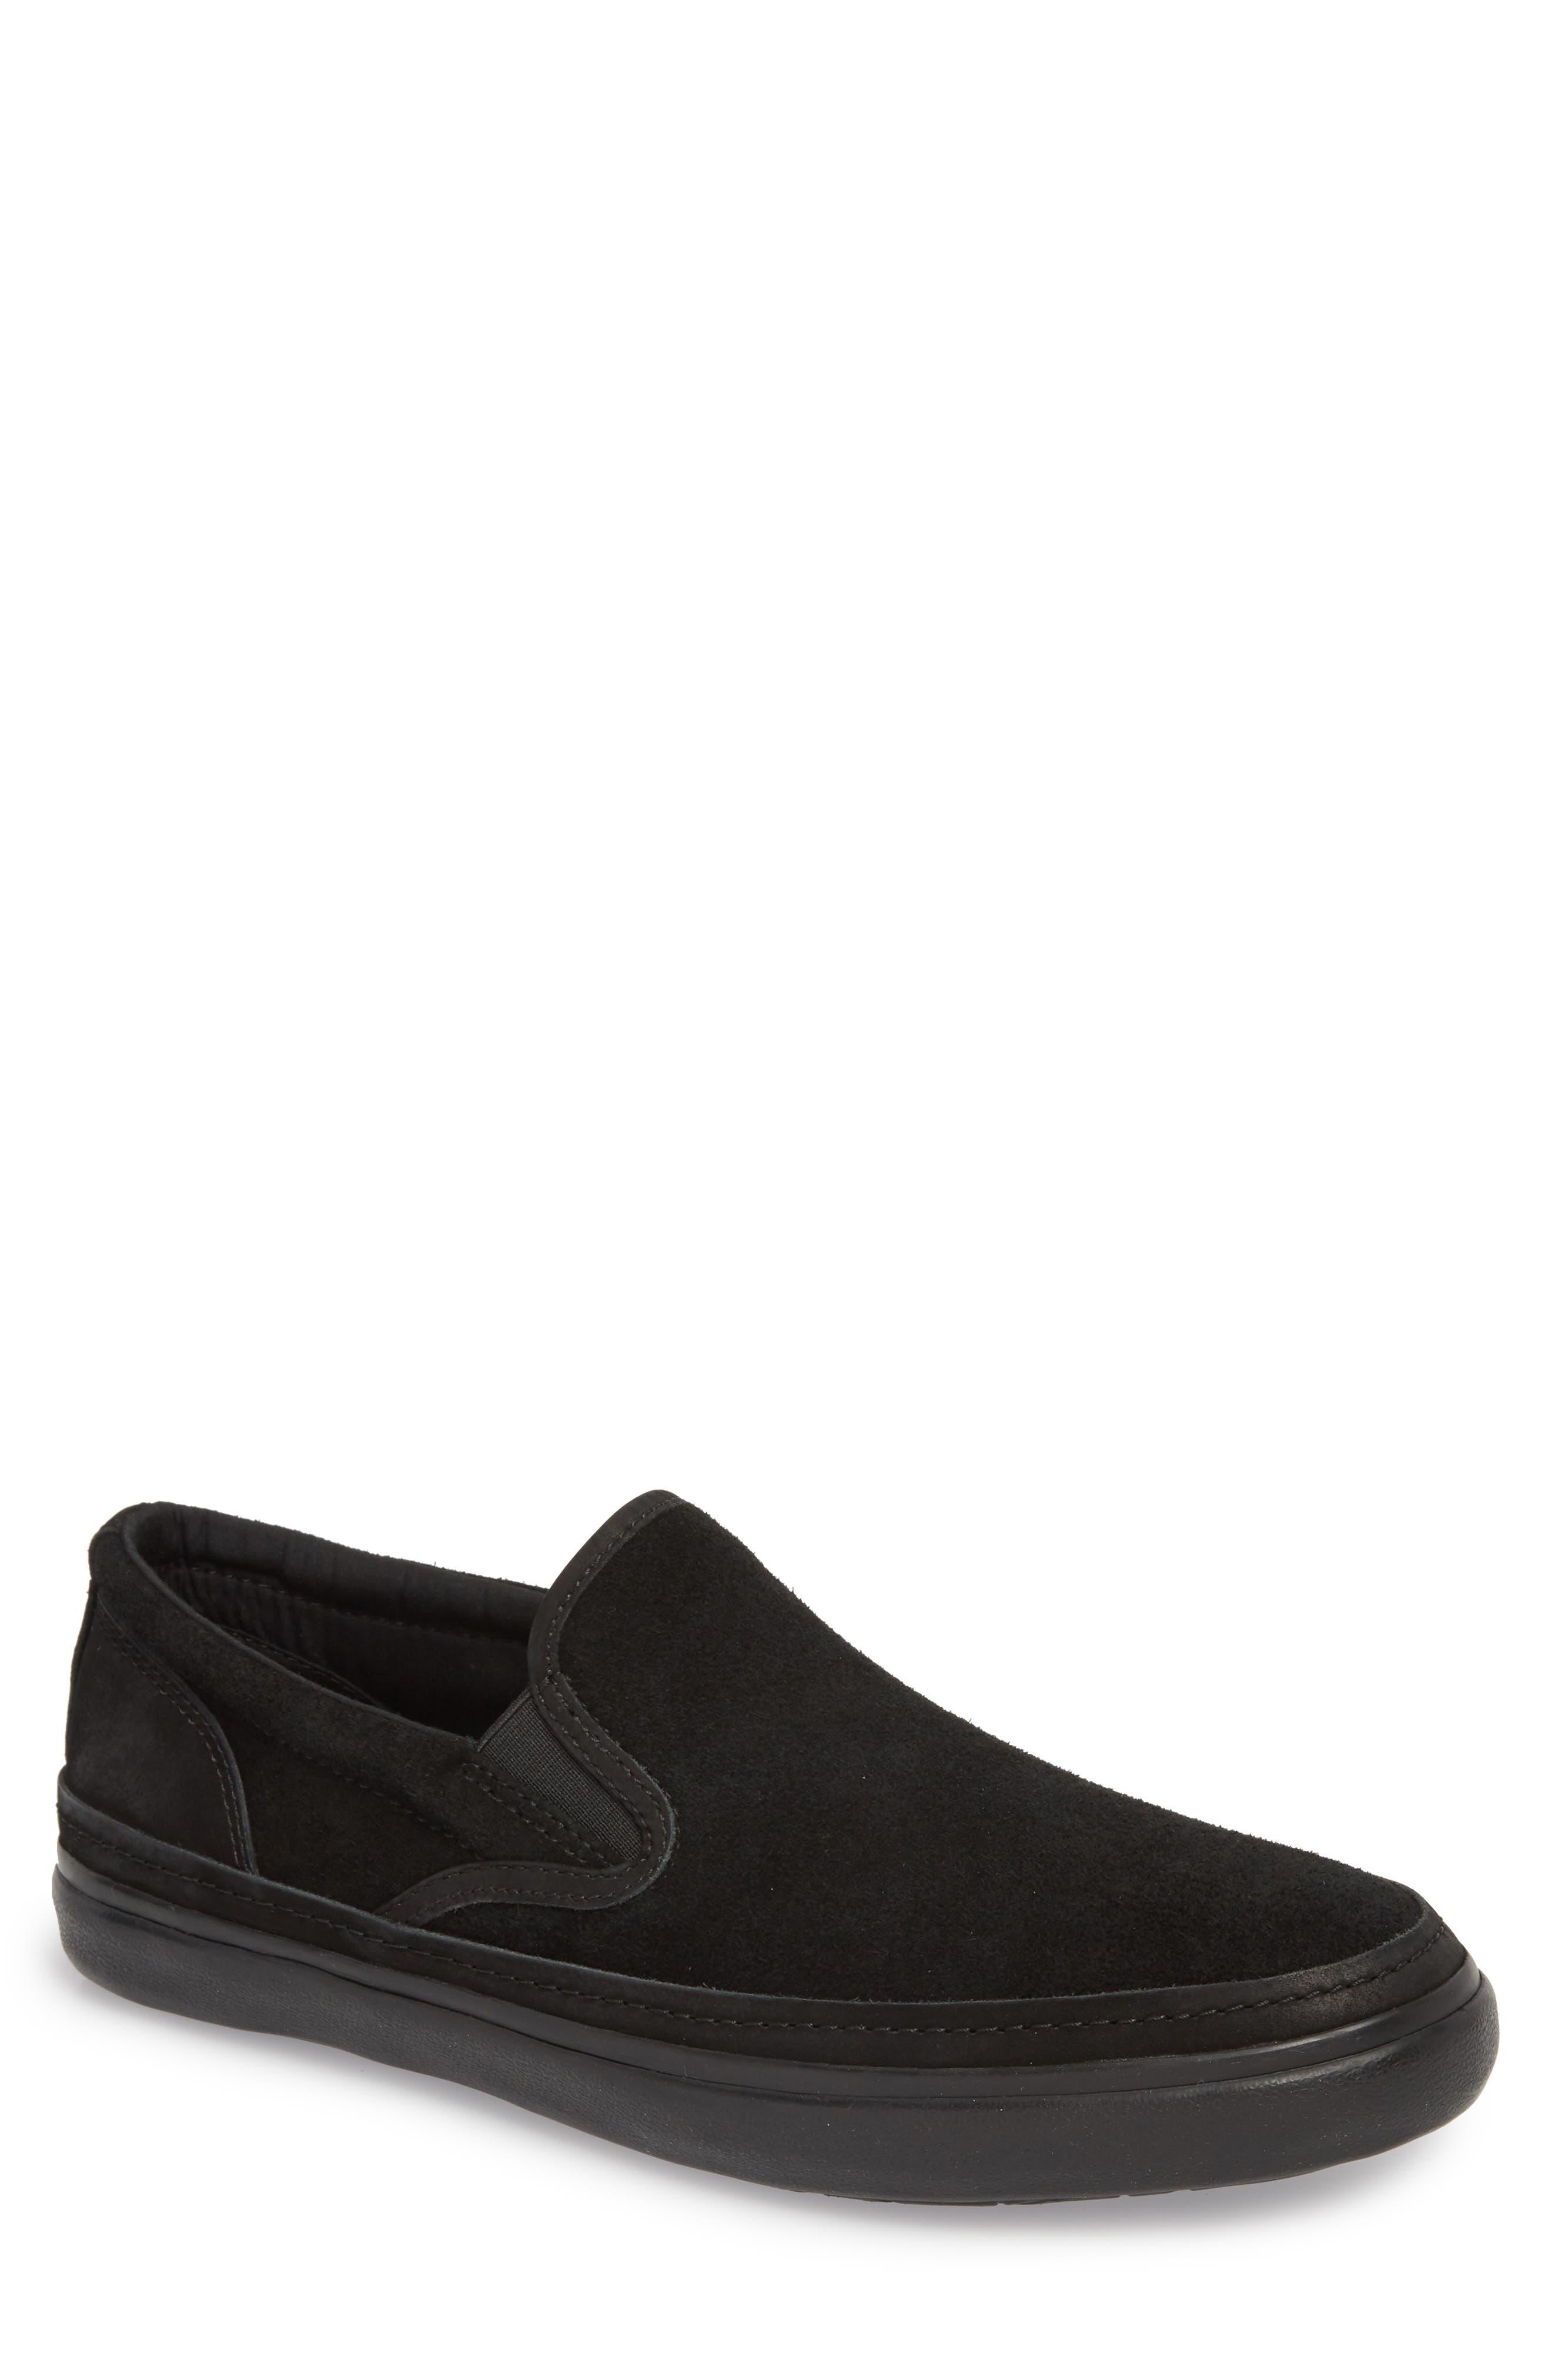 Suede Jet Slip-On Sneaker,                             Main thumbnail 1, color,                             BLACK SUEDE